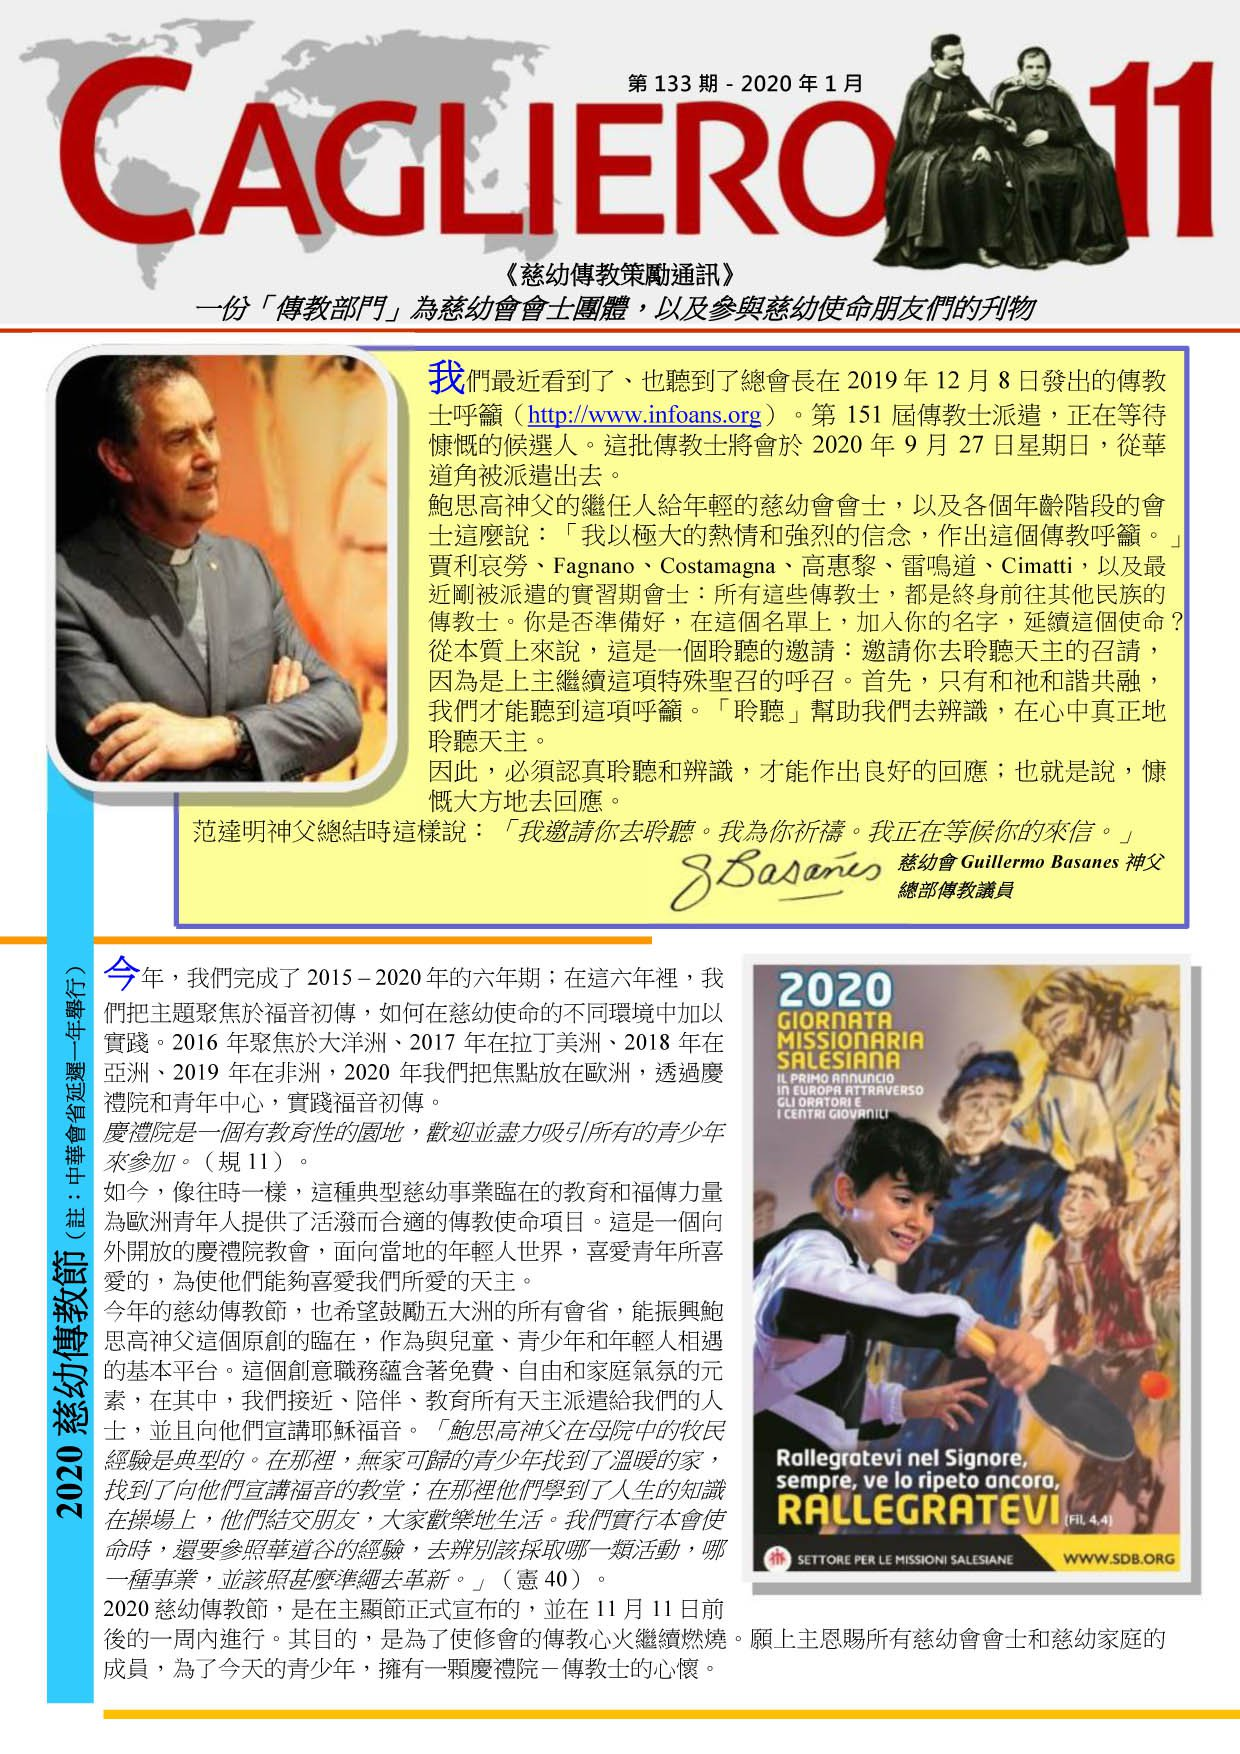 Cagliero 11 Jan 2020 中文-1